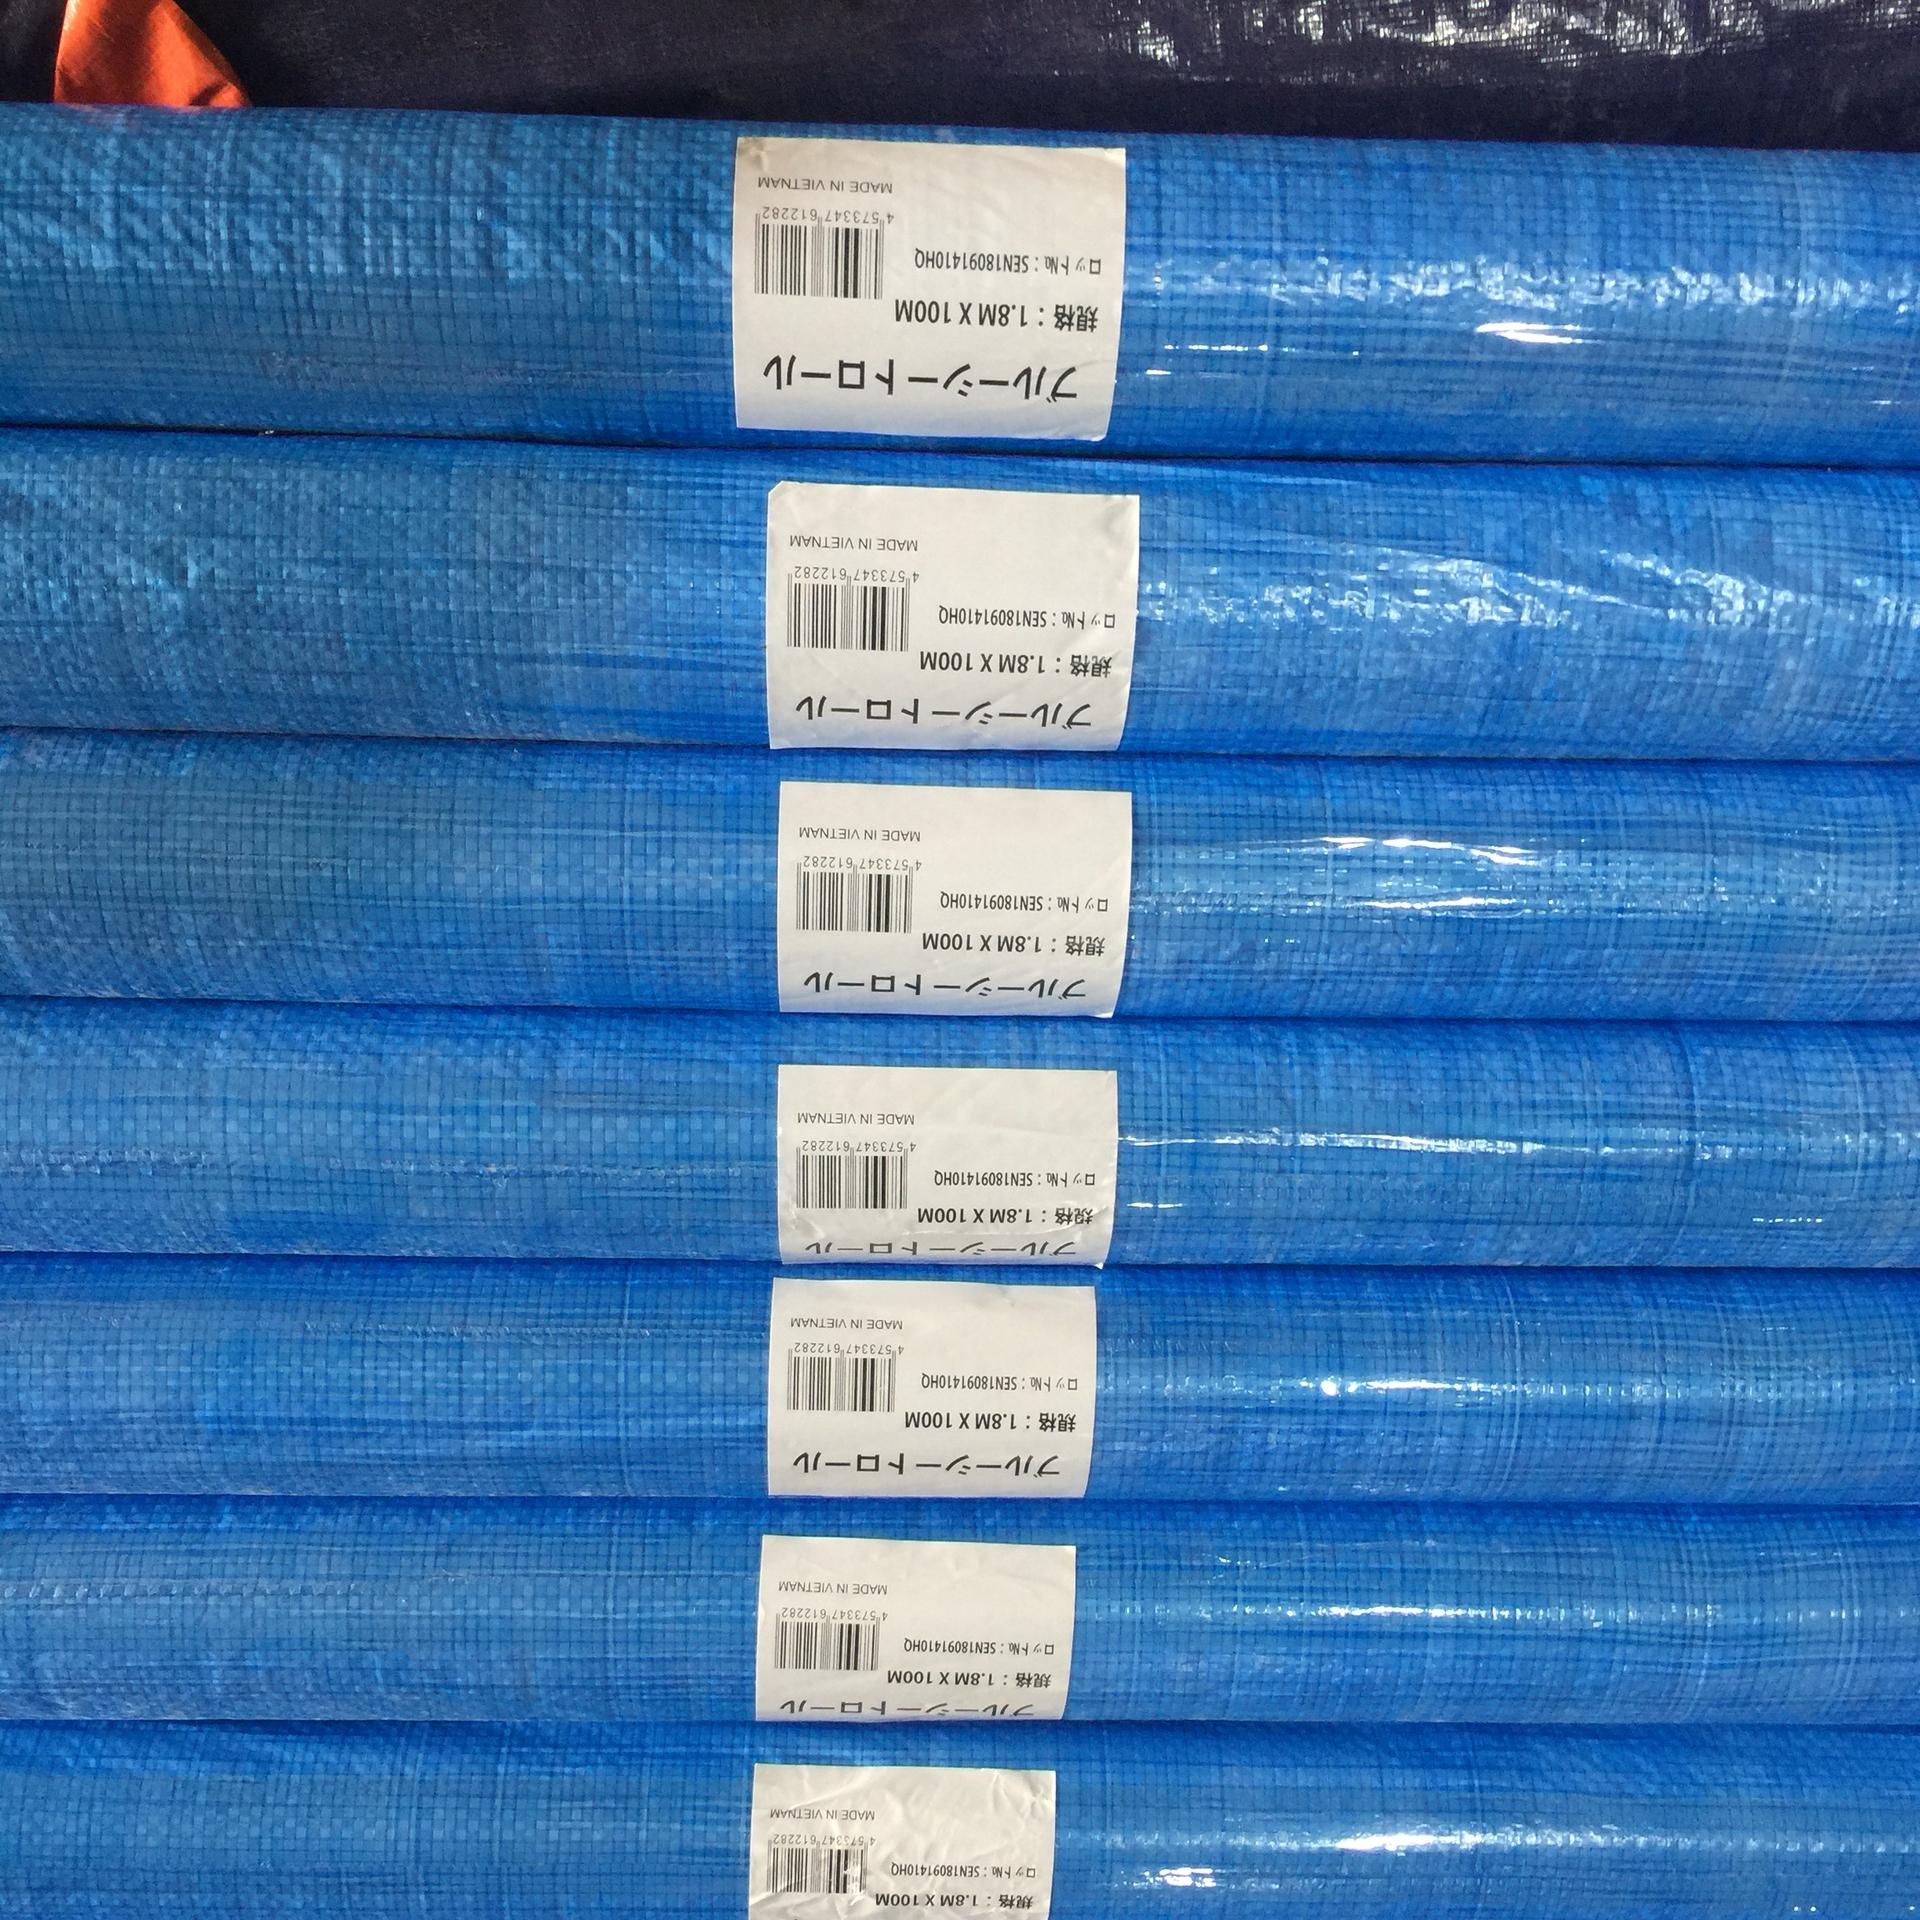 Синие рулоны ПЭ брезента, сделано во Вьетнаме